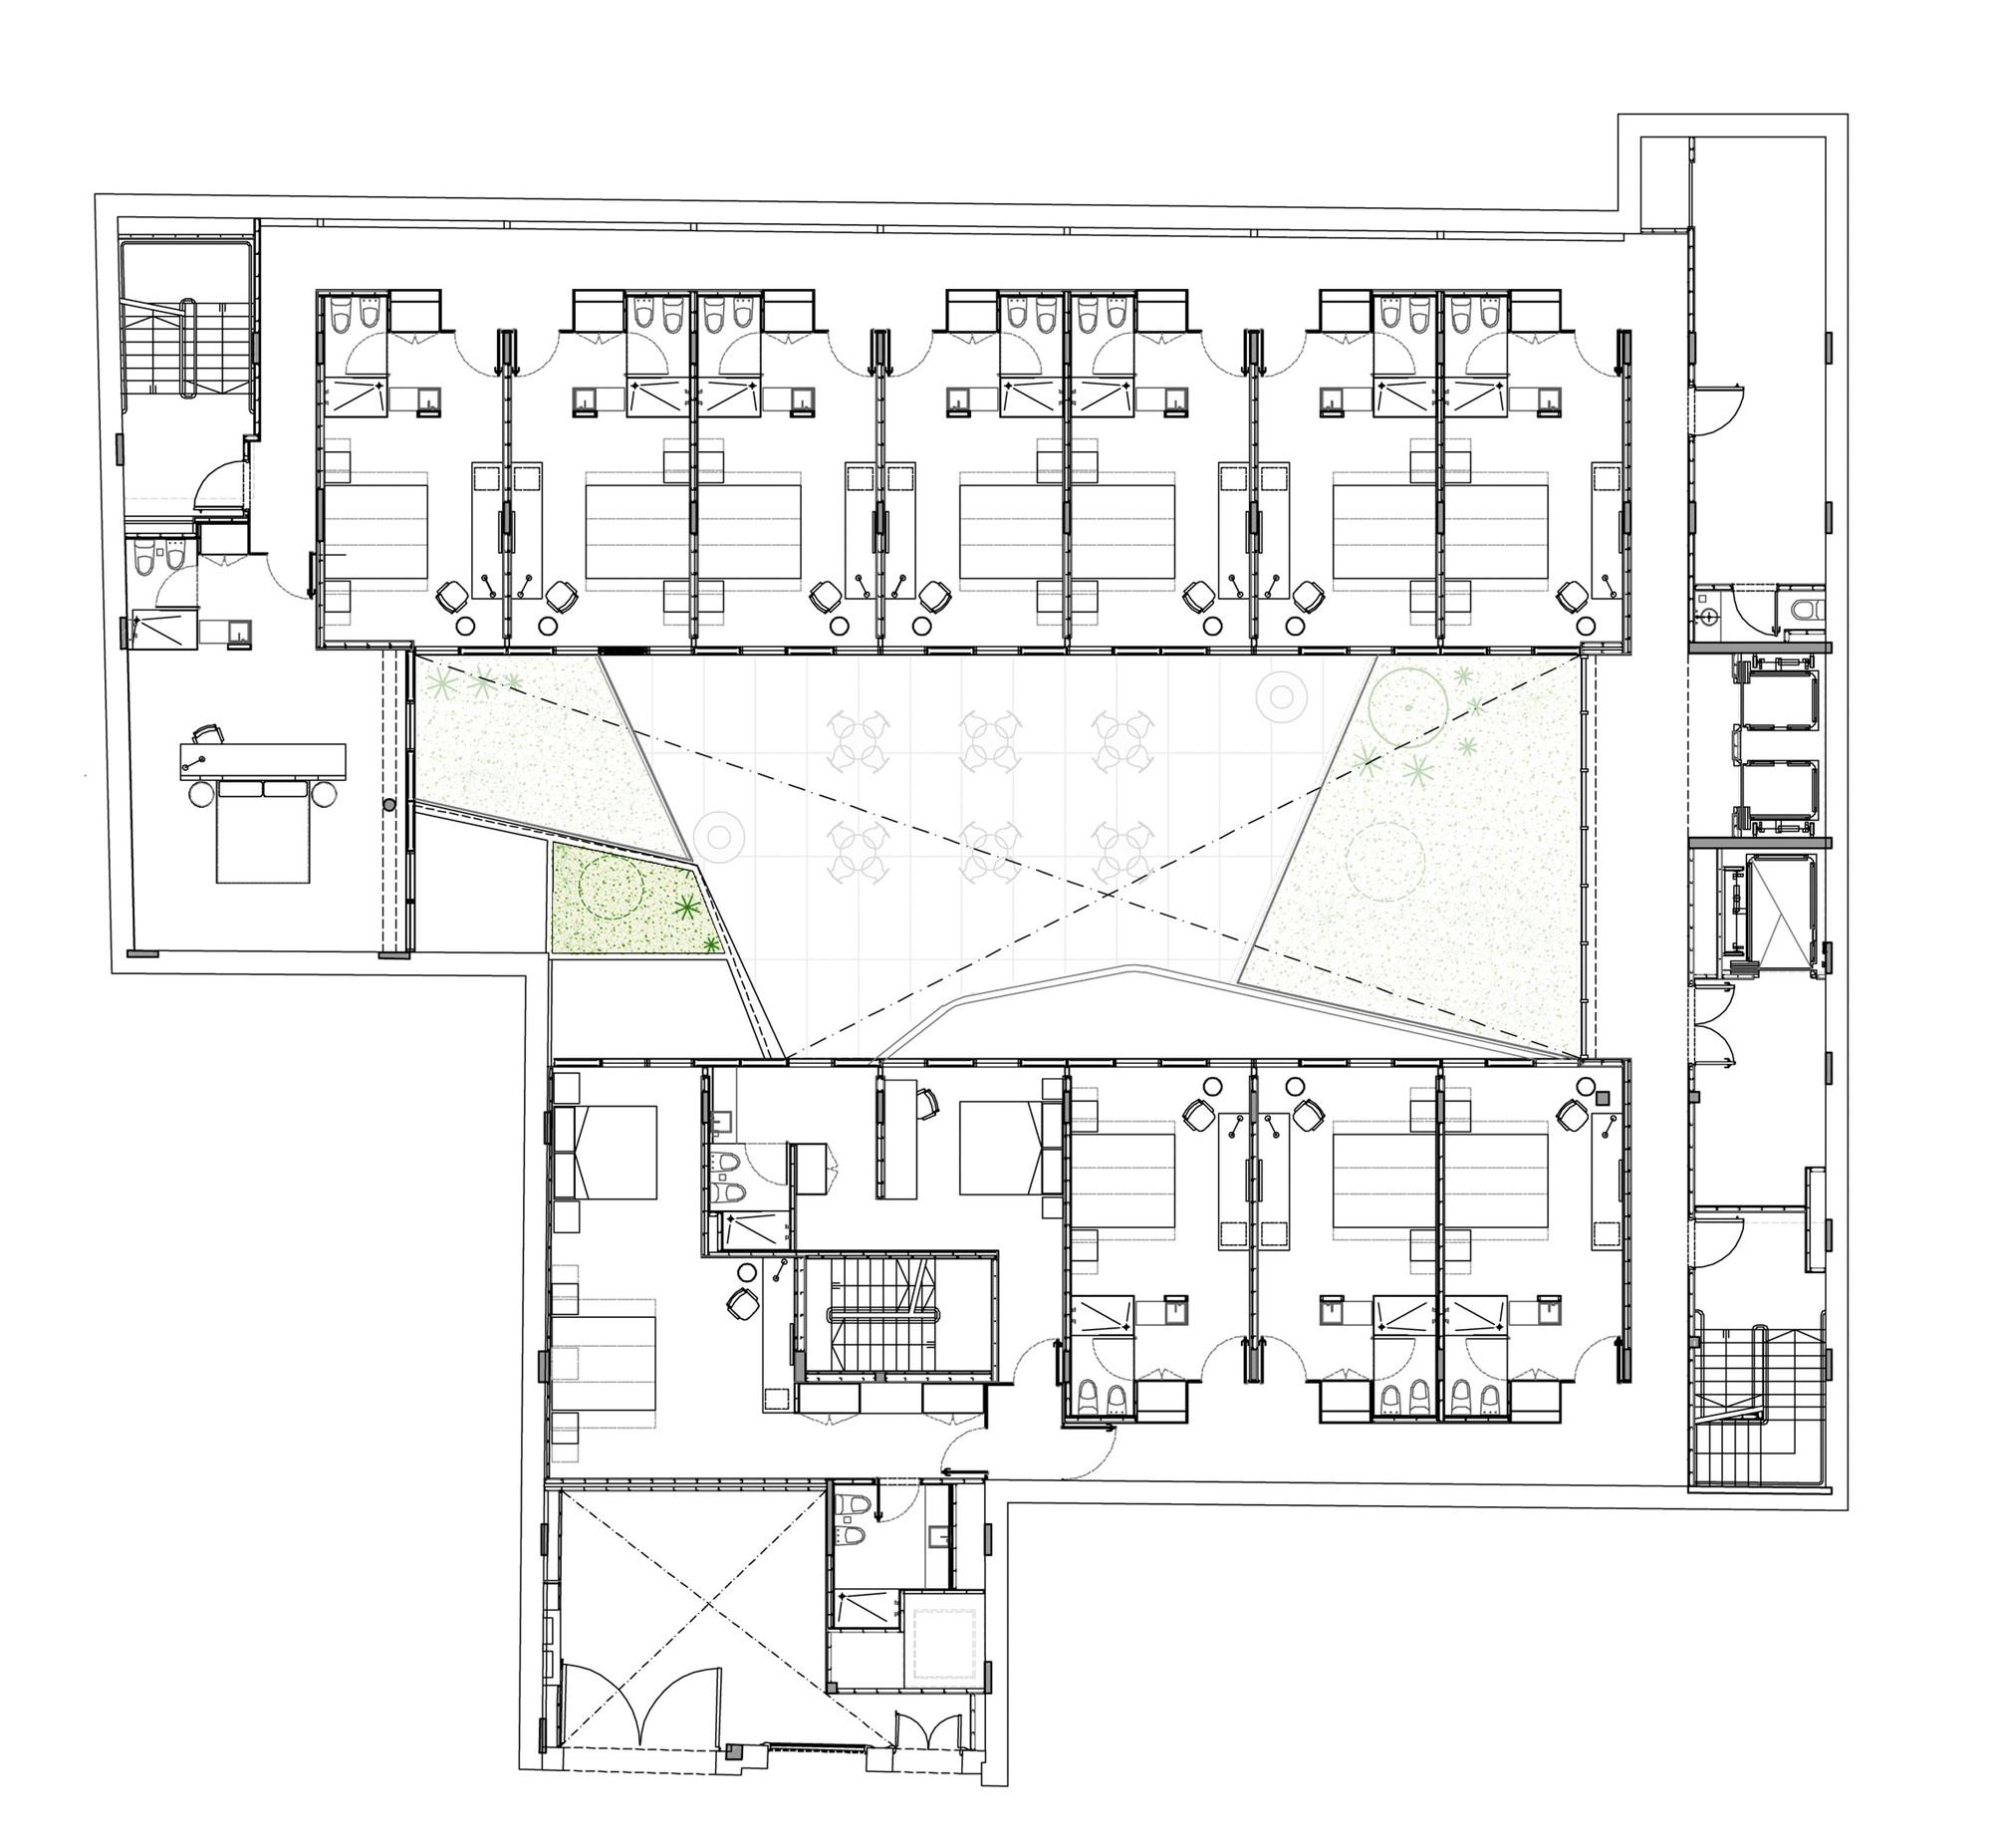 Galeria de hotel me san telmo estudio rietti smud 10 for Hoteles en planta